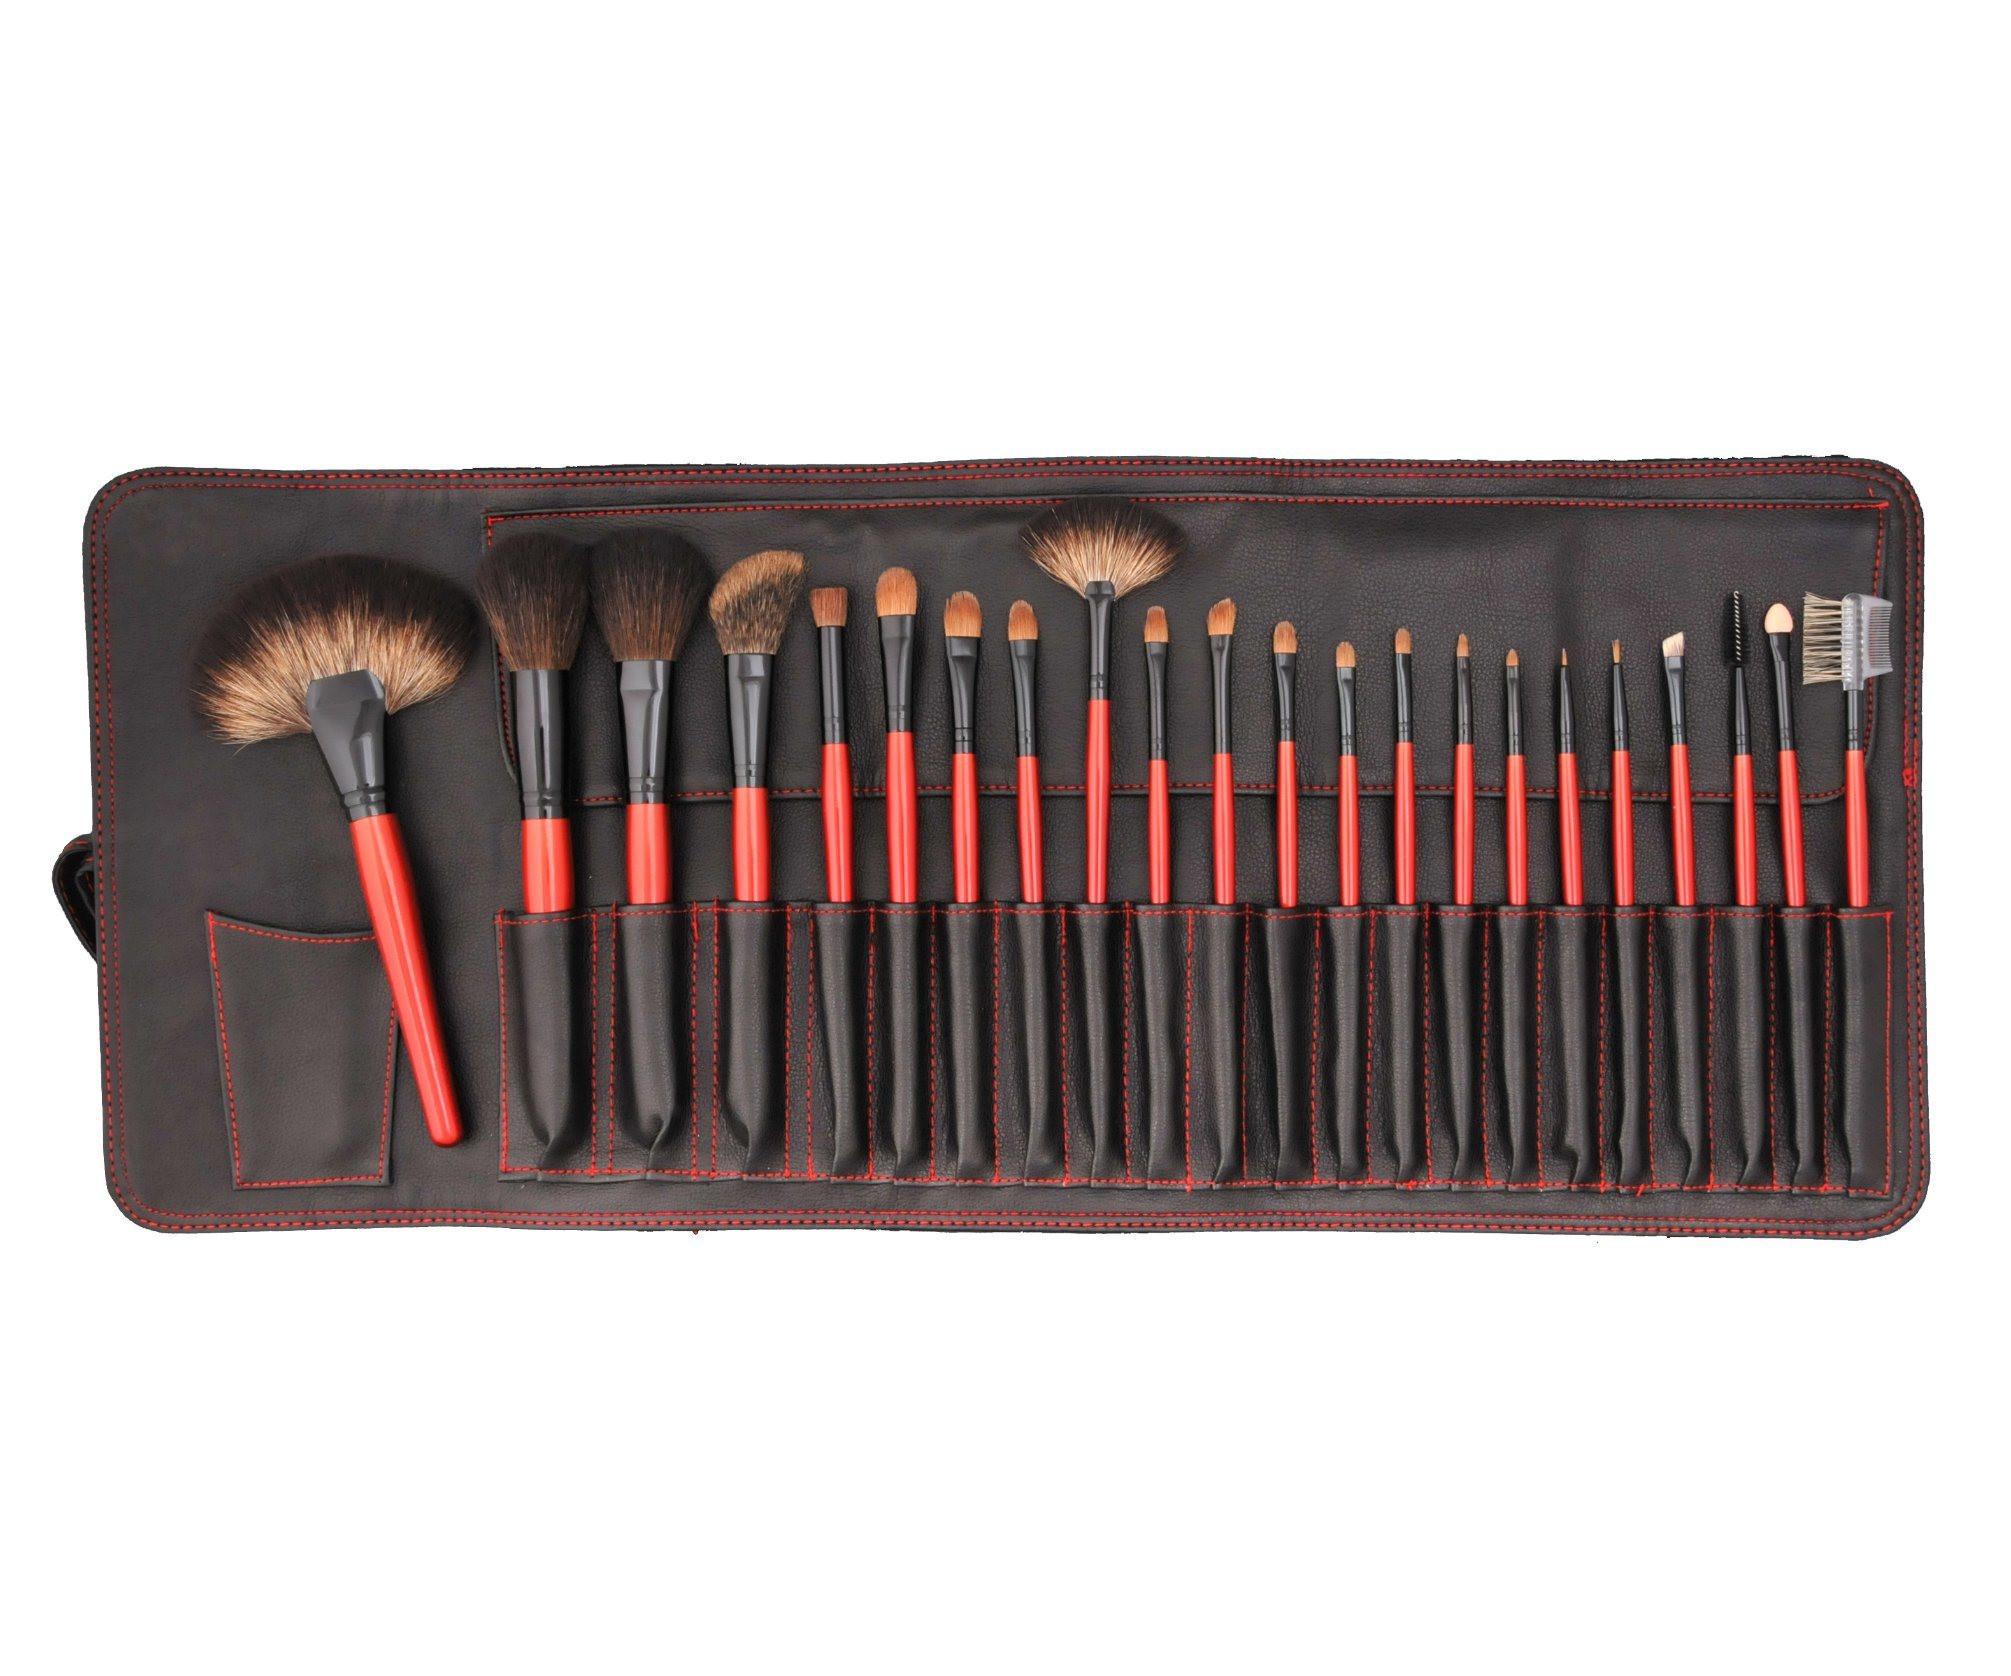 Wholesales Makeup Brush 24PCS Brushes